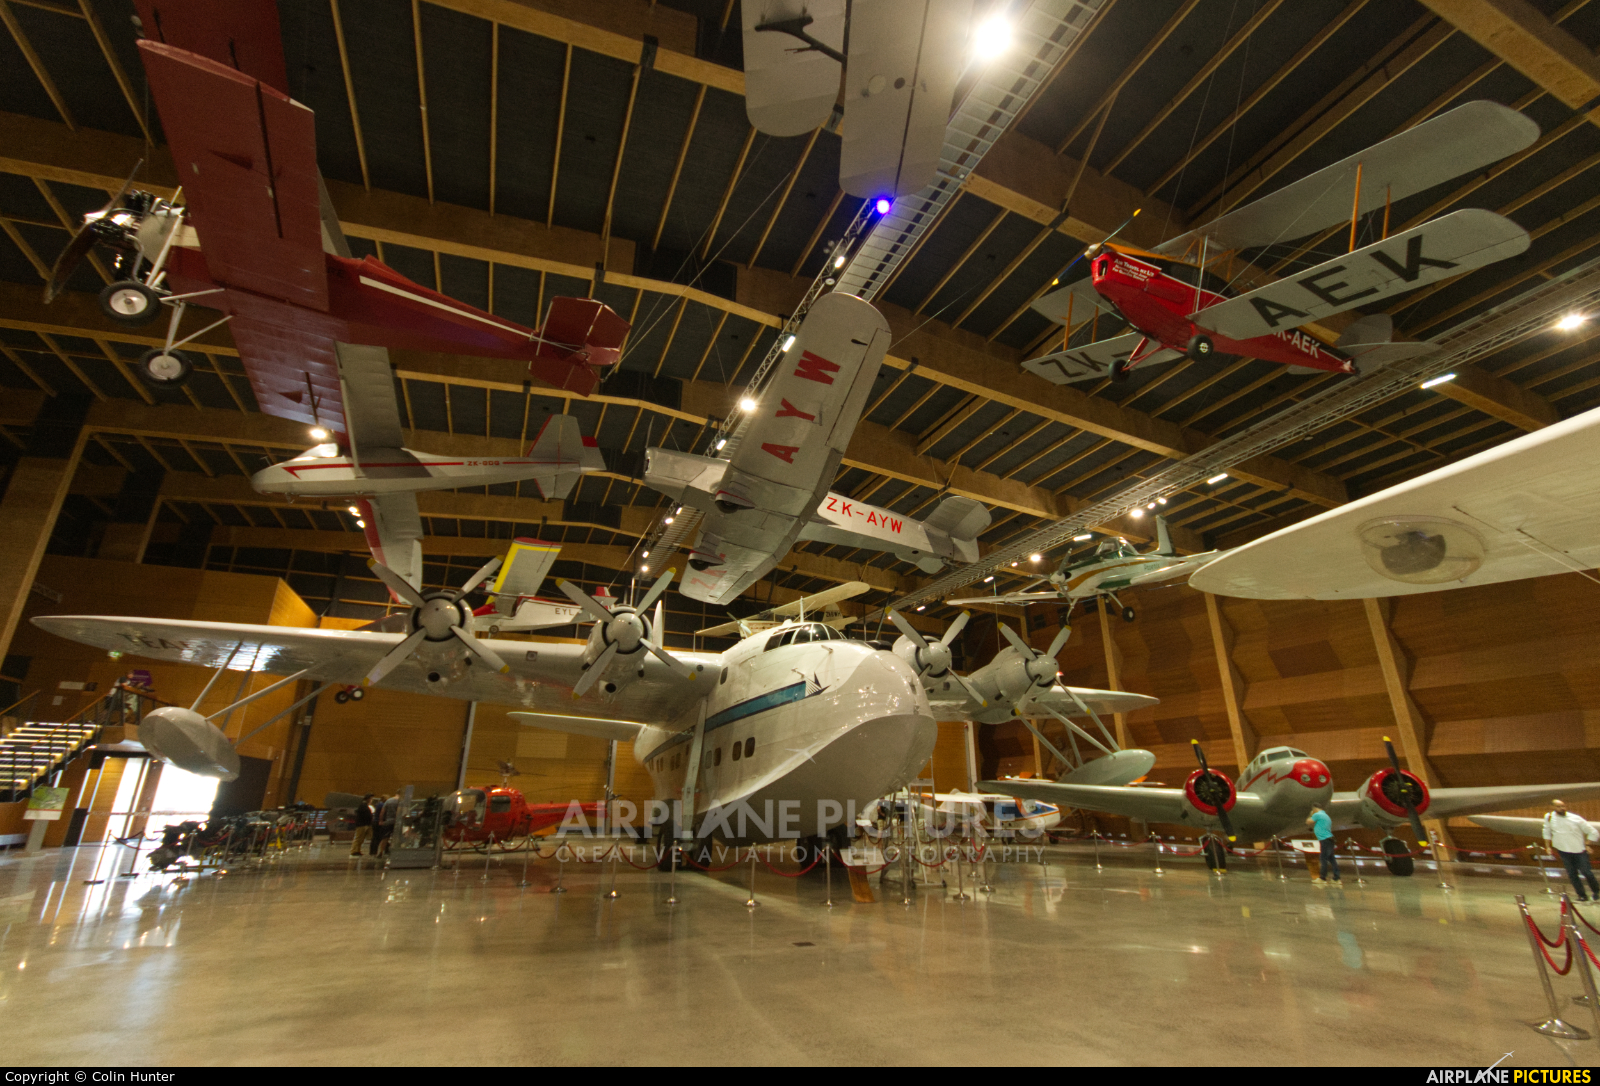 Tasman Empire Airways Ltd(TEAL) ZK-AMO aircraft at Off Airport - New Zealand